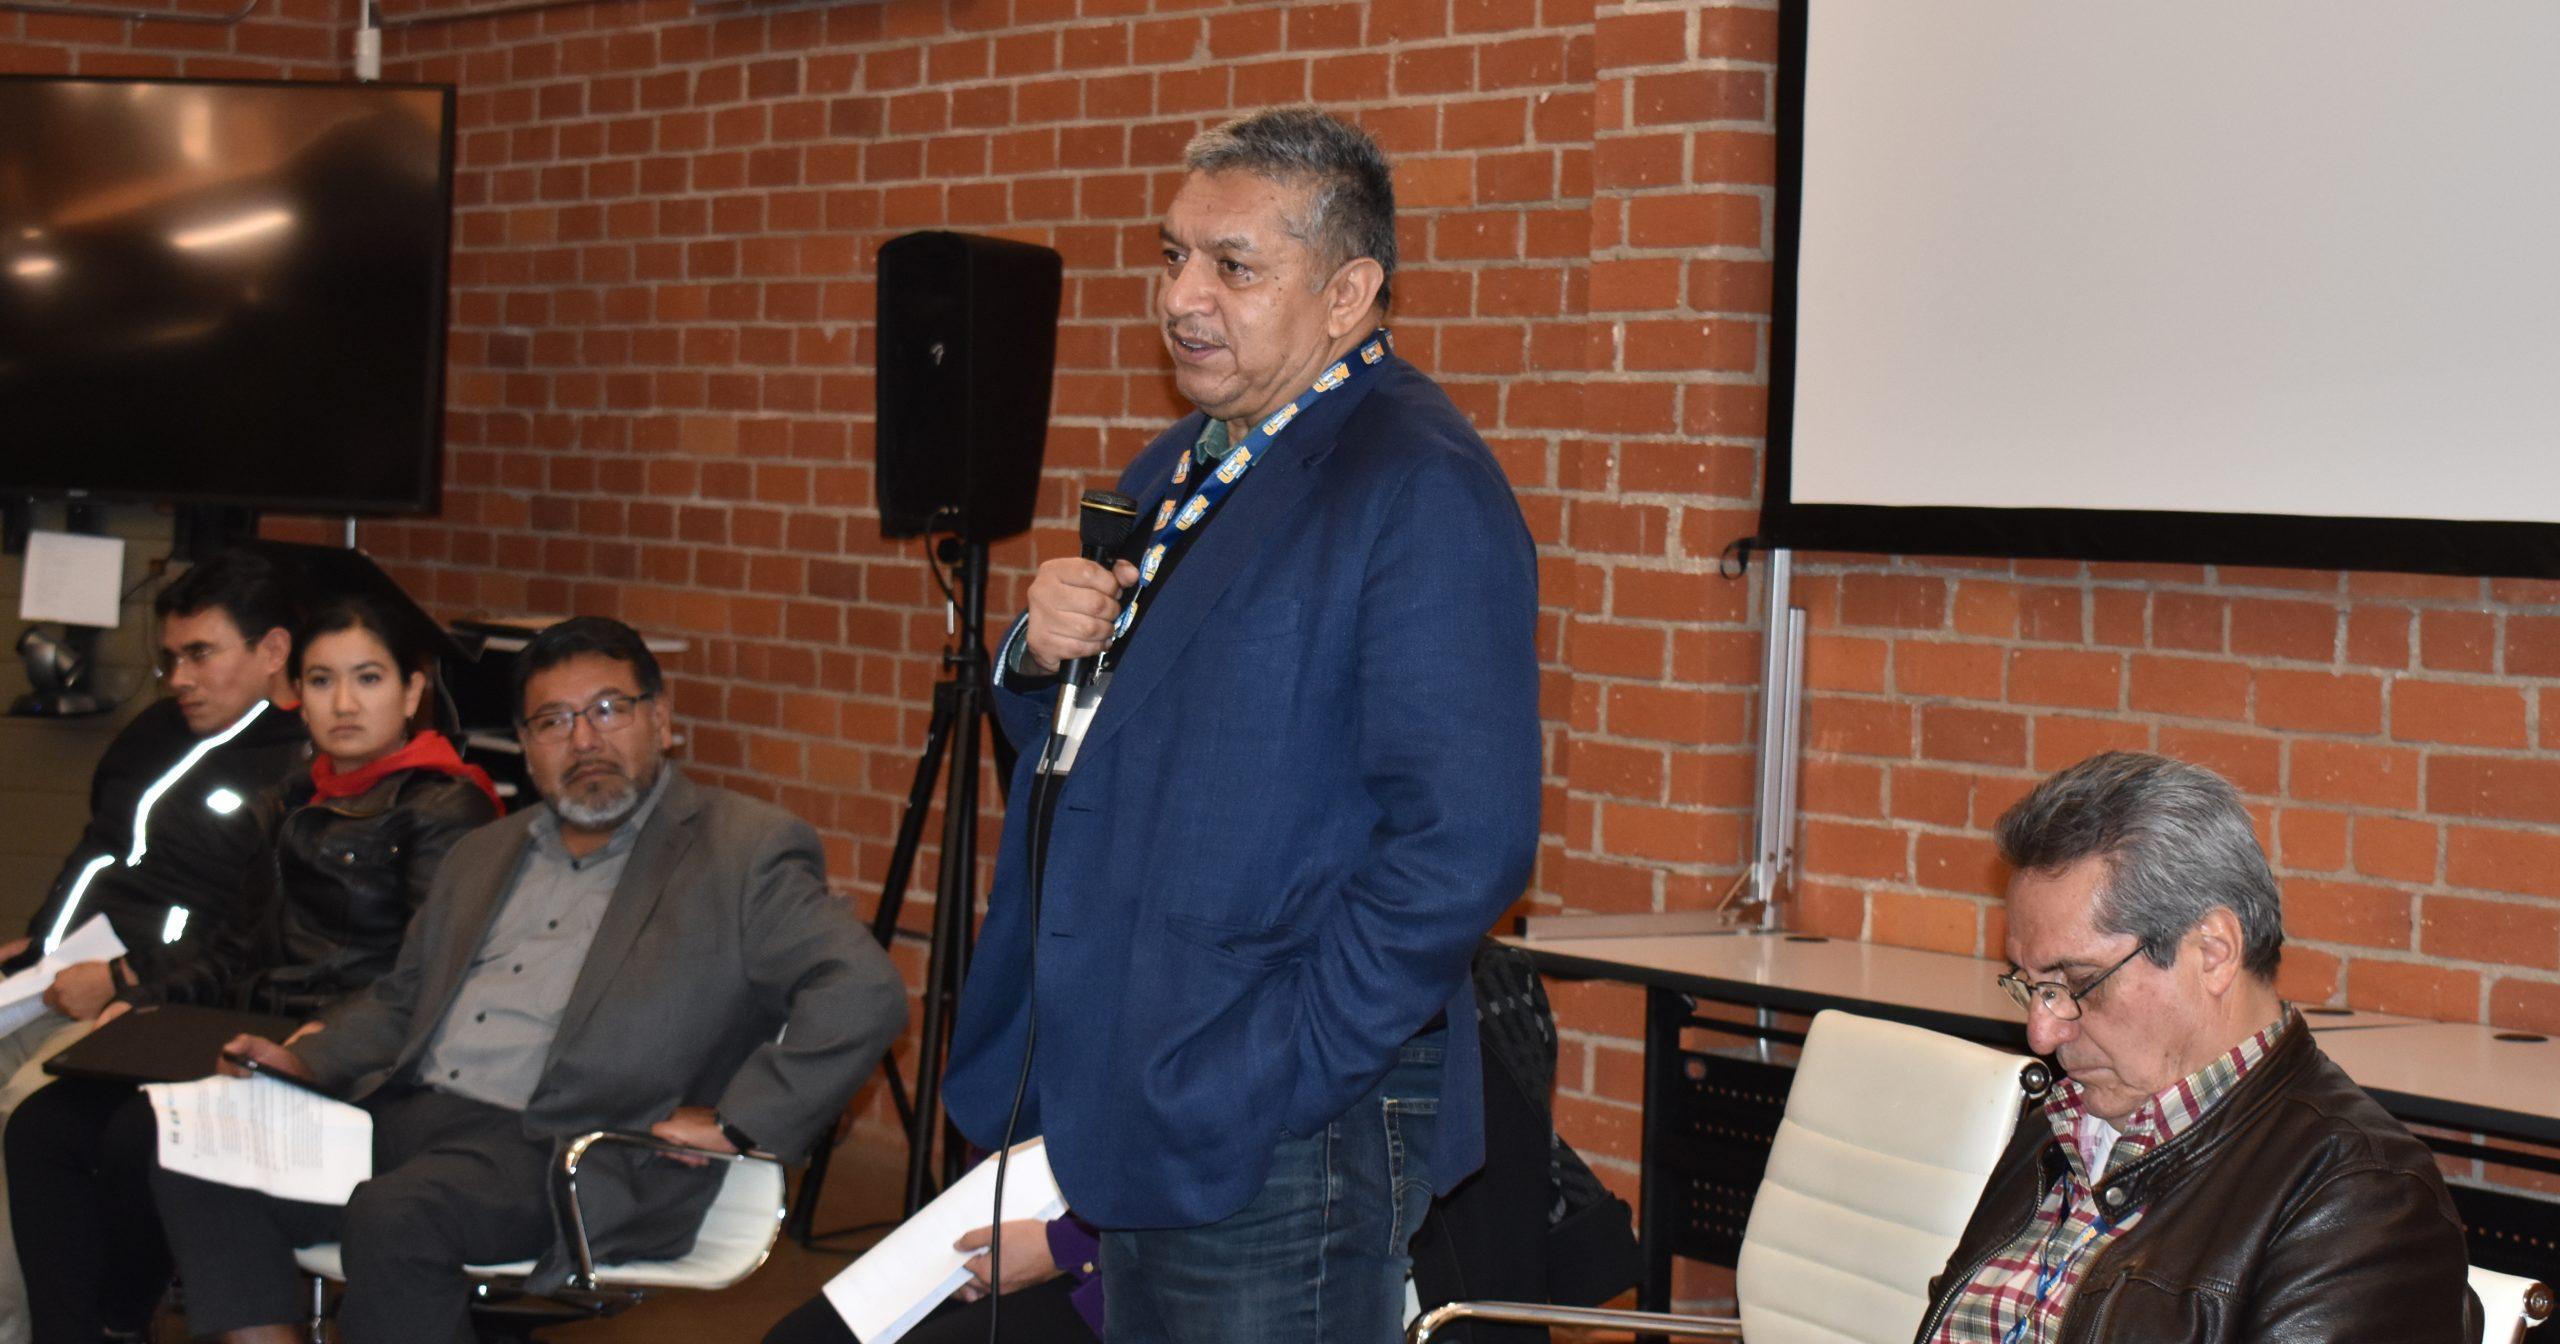 Jose Humberto Montes de Oca speaking into a microphone